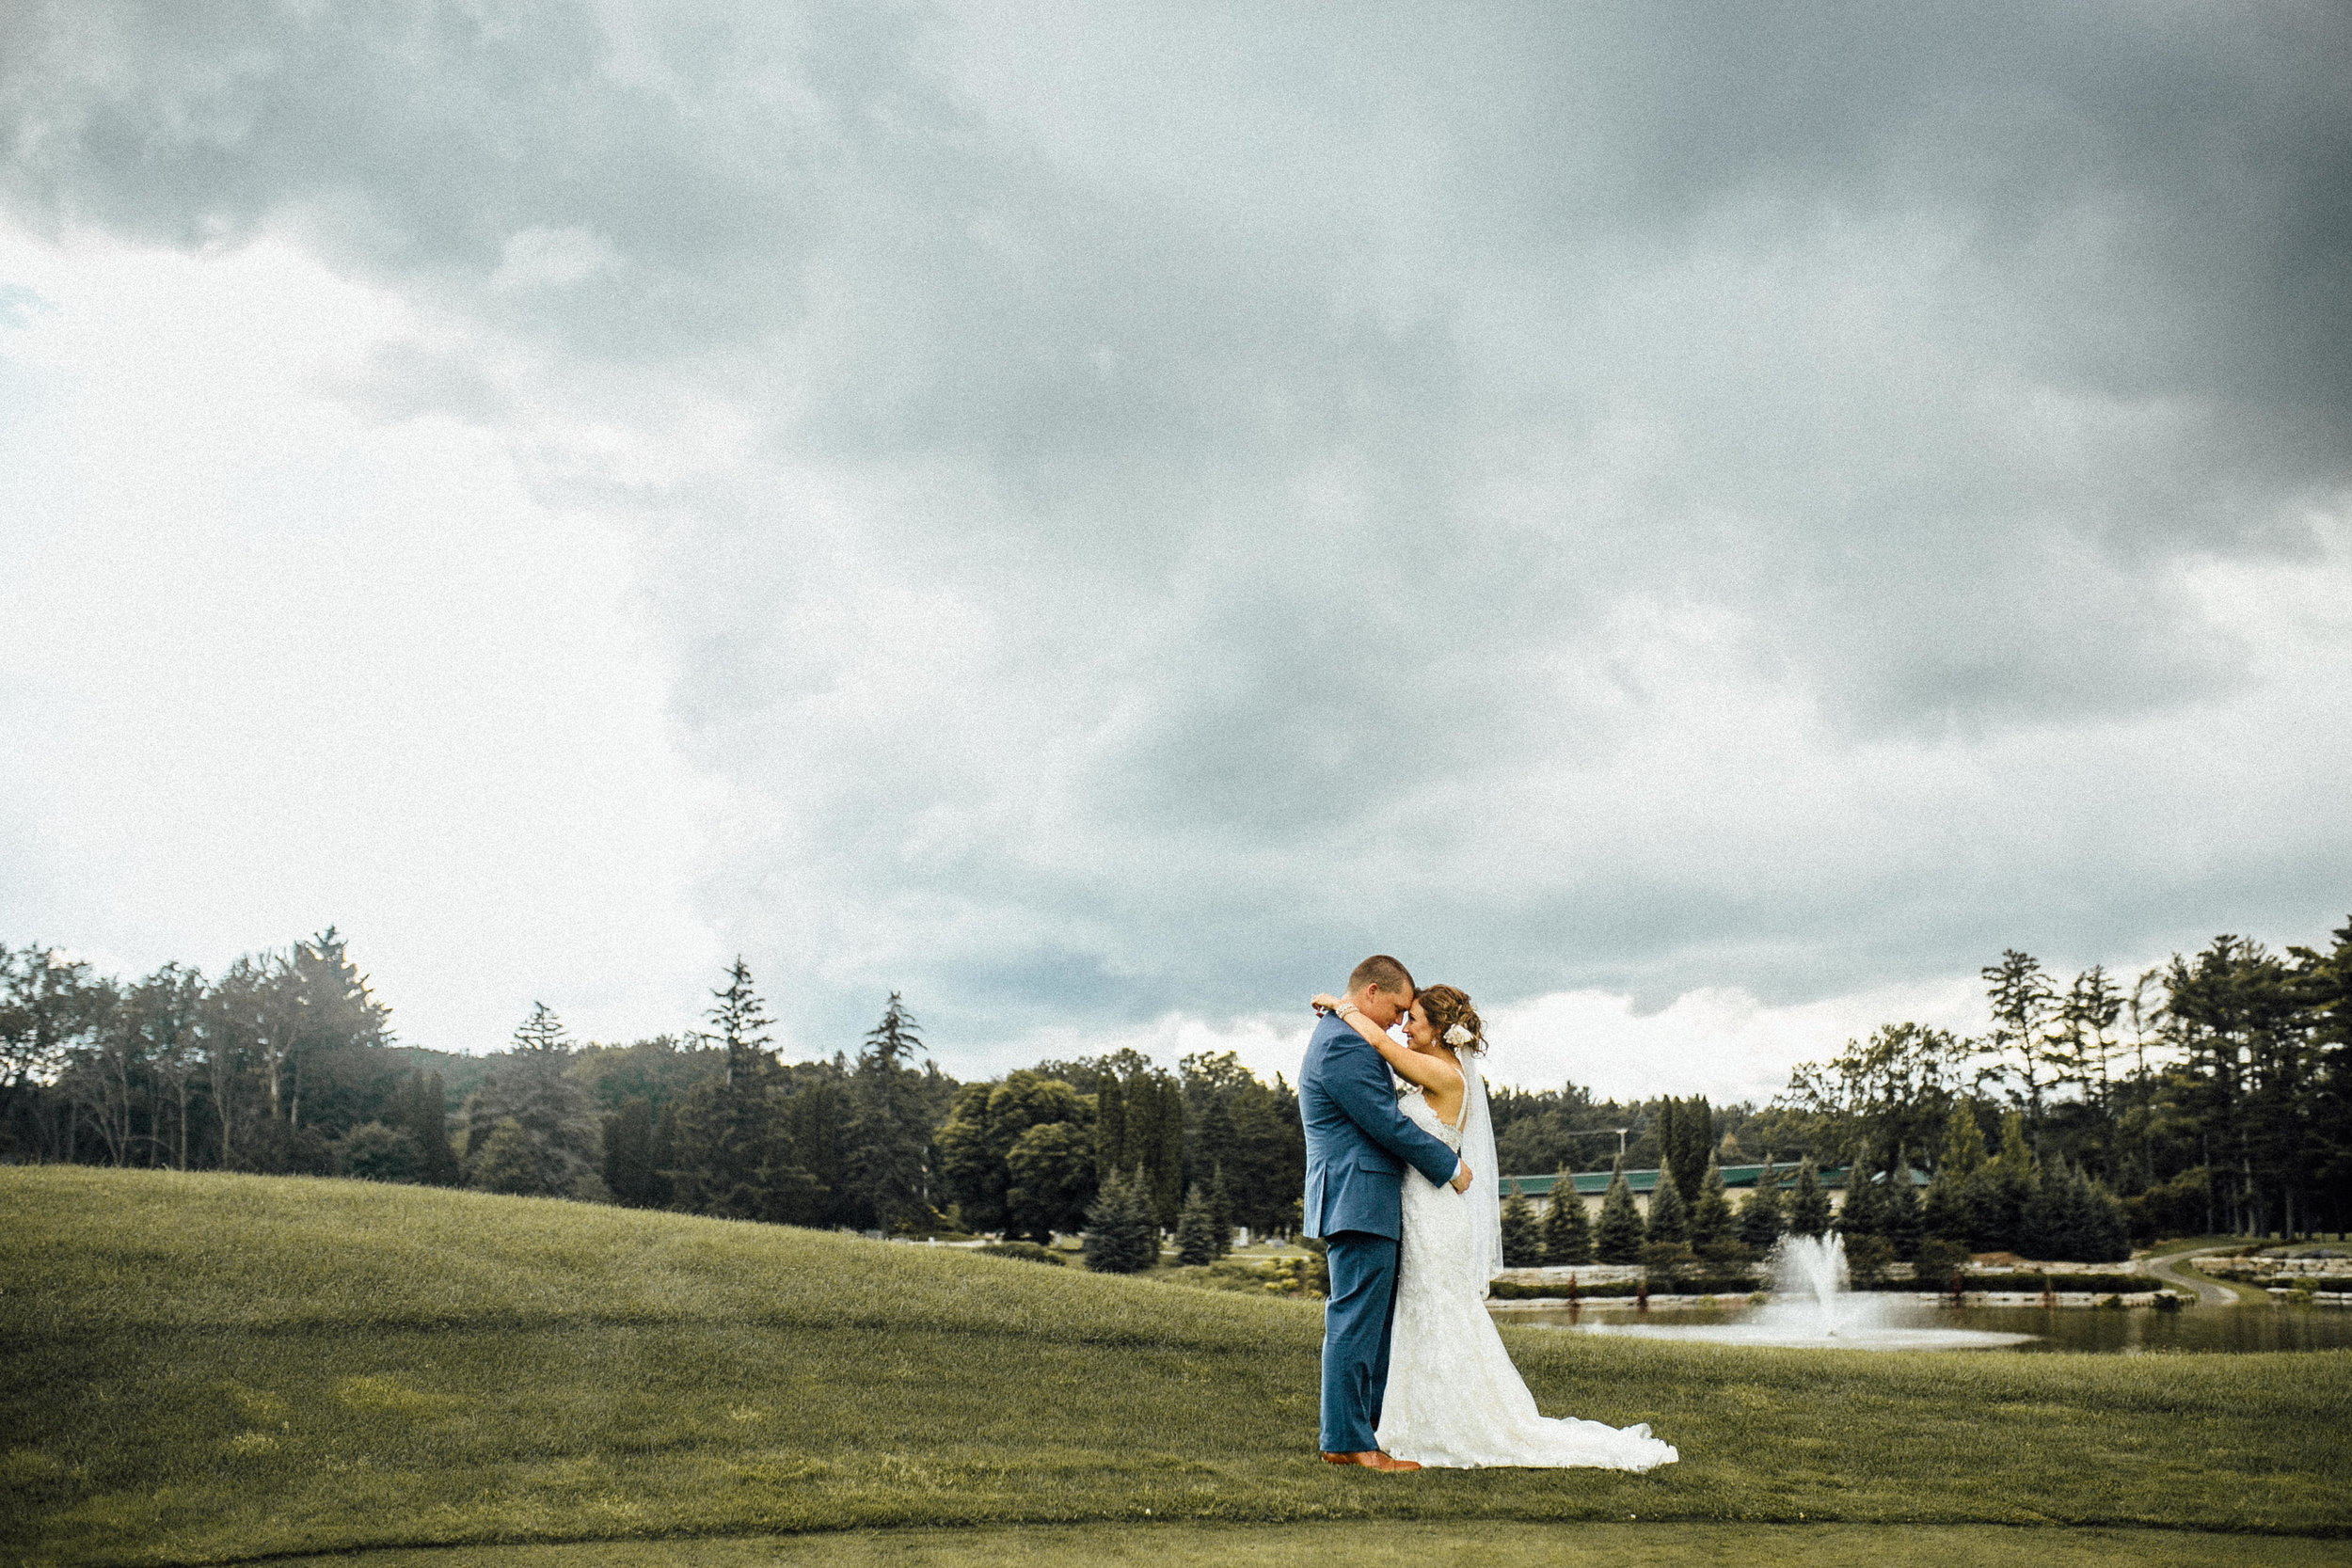 Whitney-Kevin-Portraits-Michigan-Wedding-Photographer-306.jpg